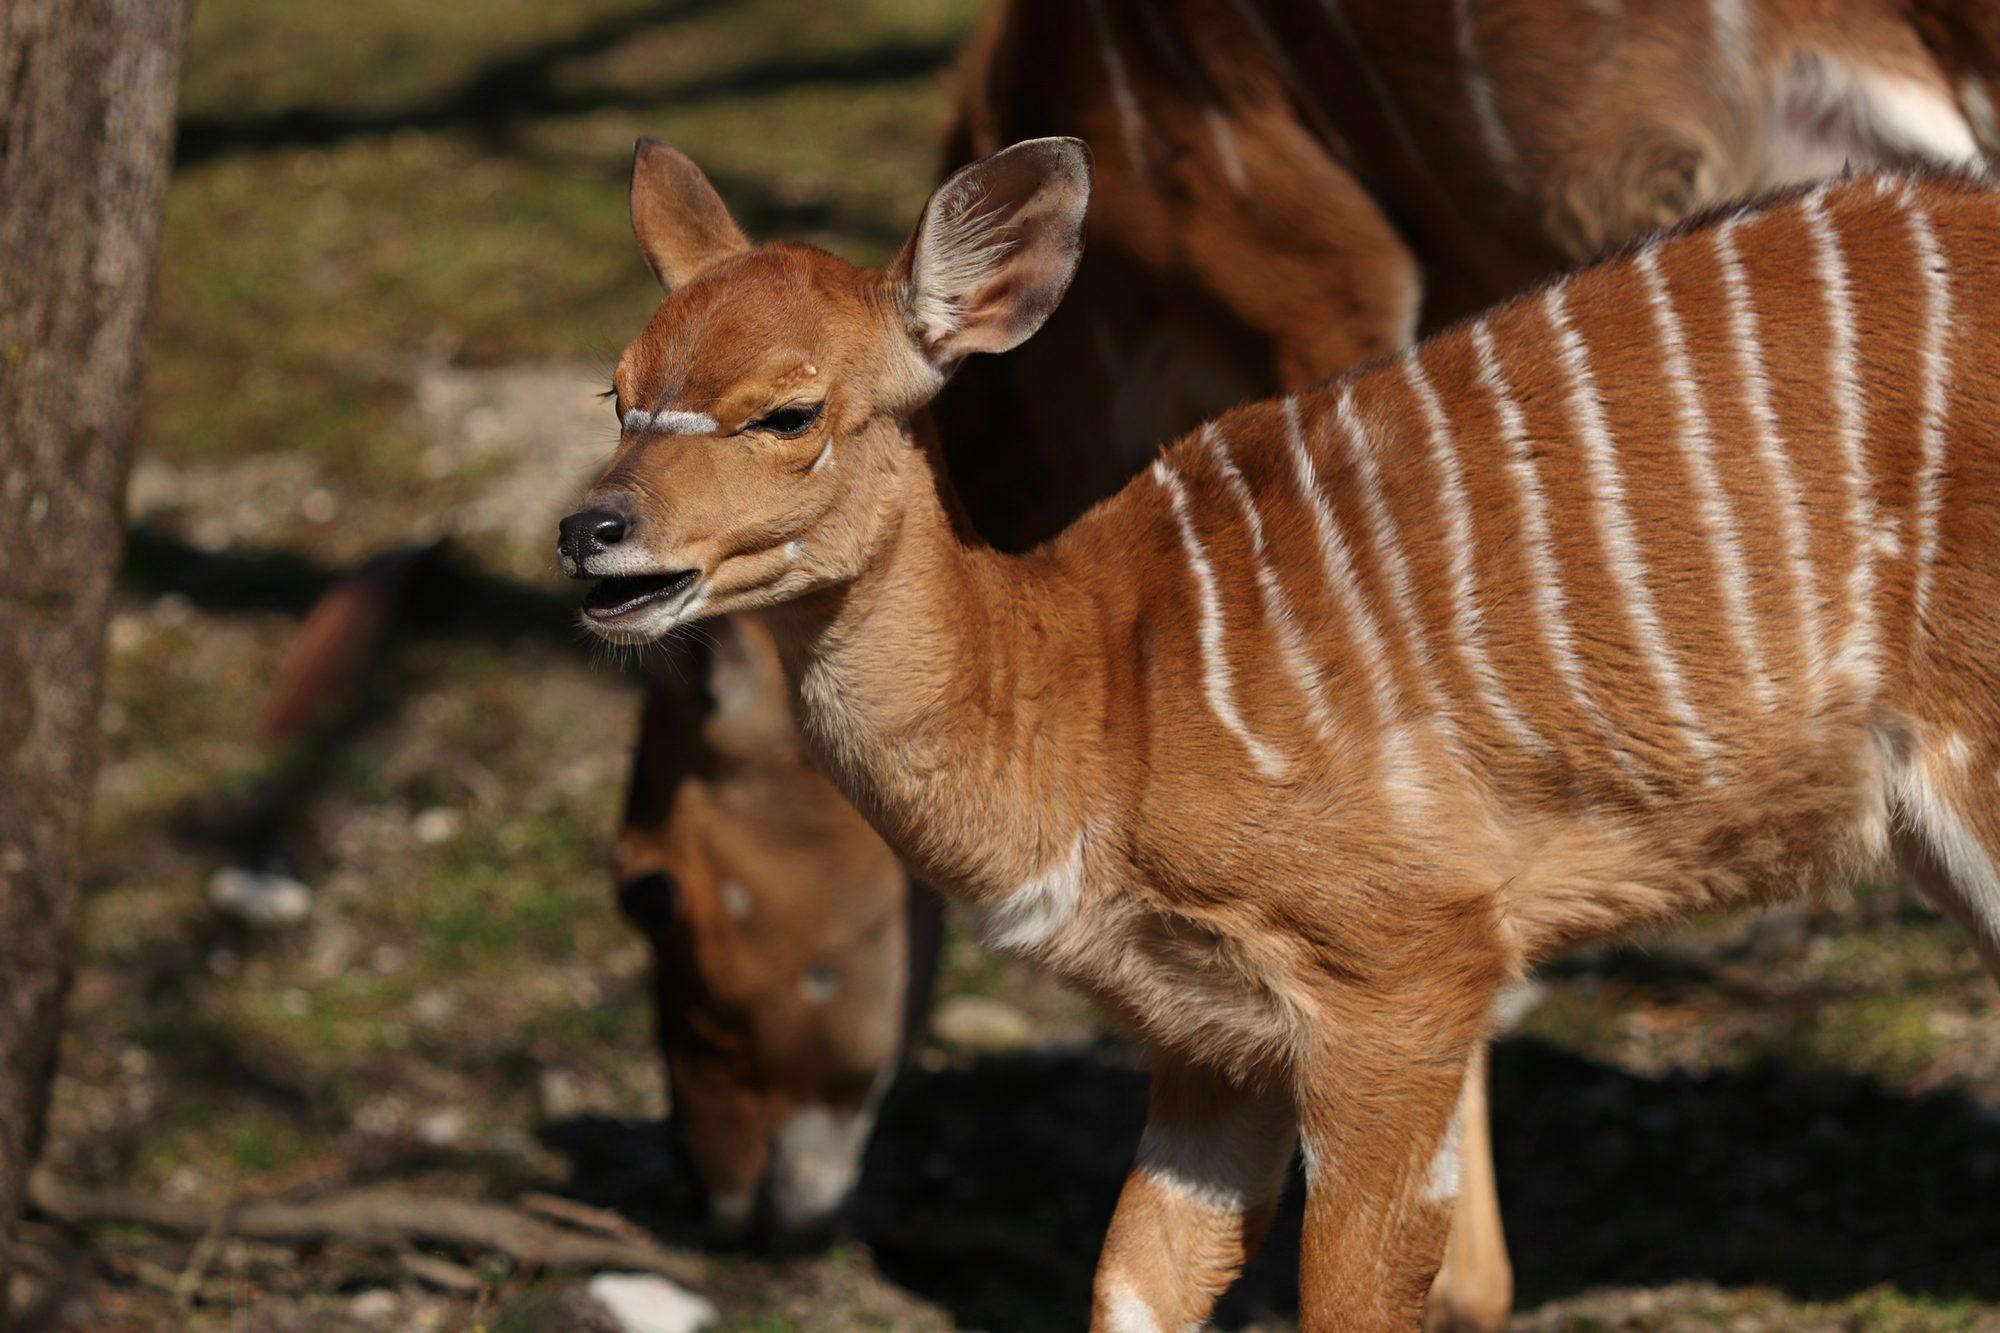 Nyala-Nachwuchs im Tierpark Hellabrunn